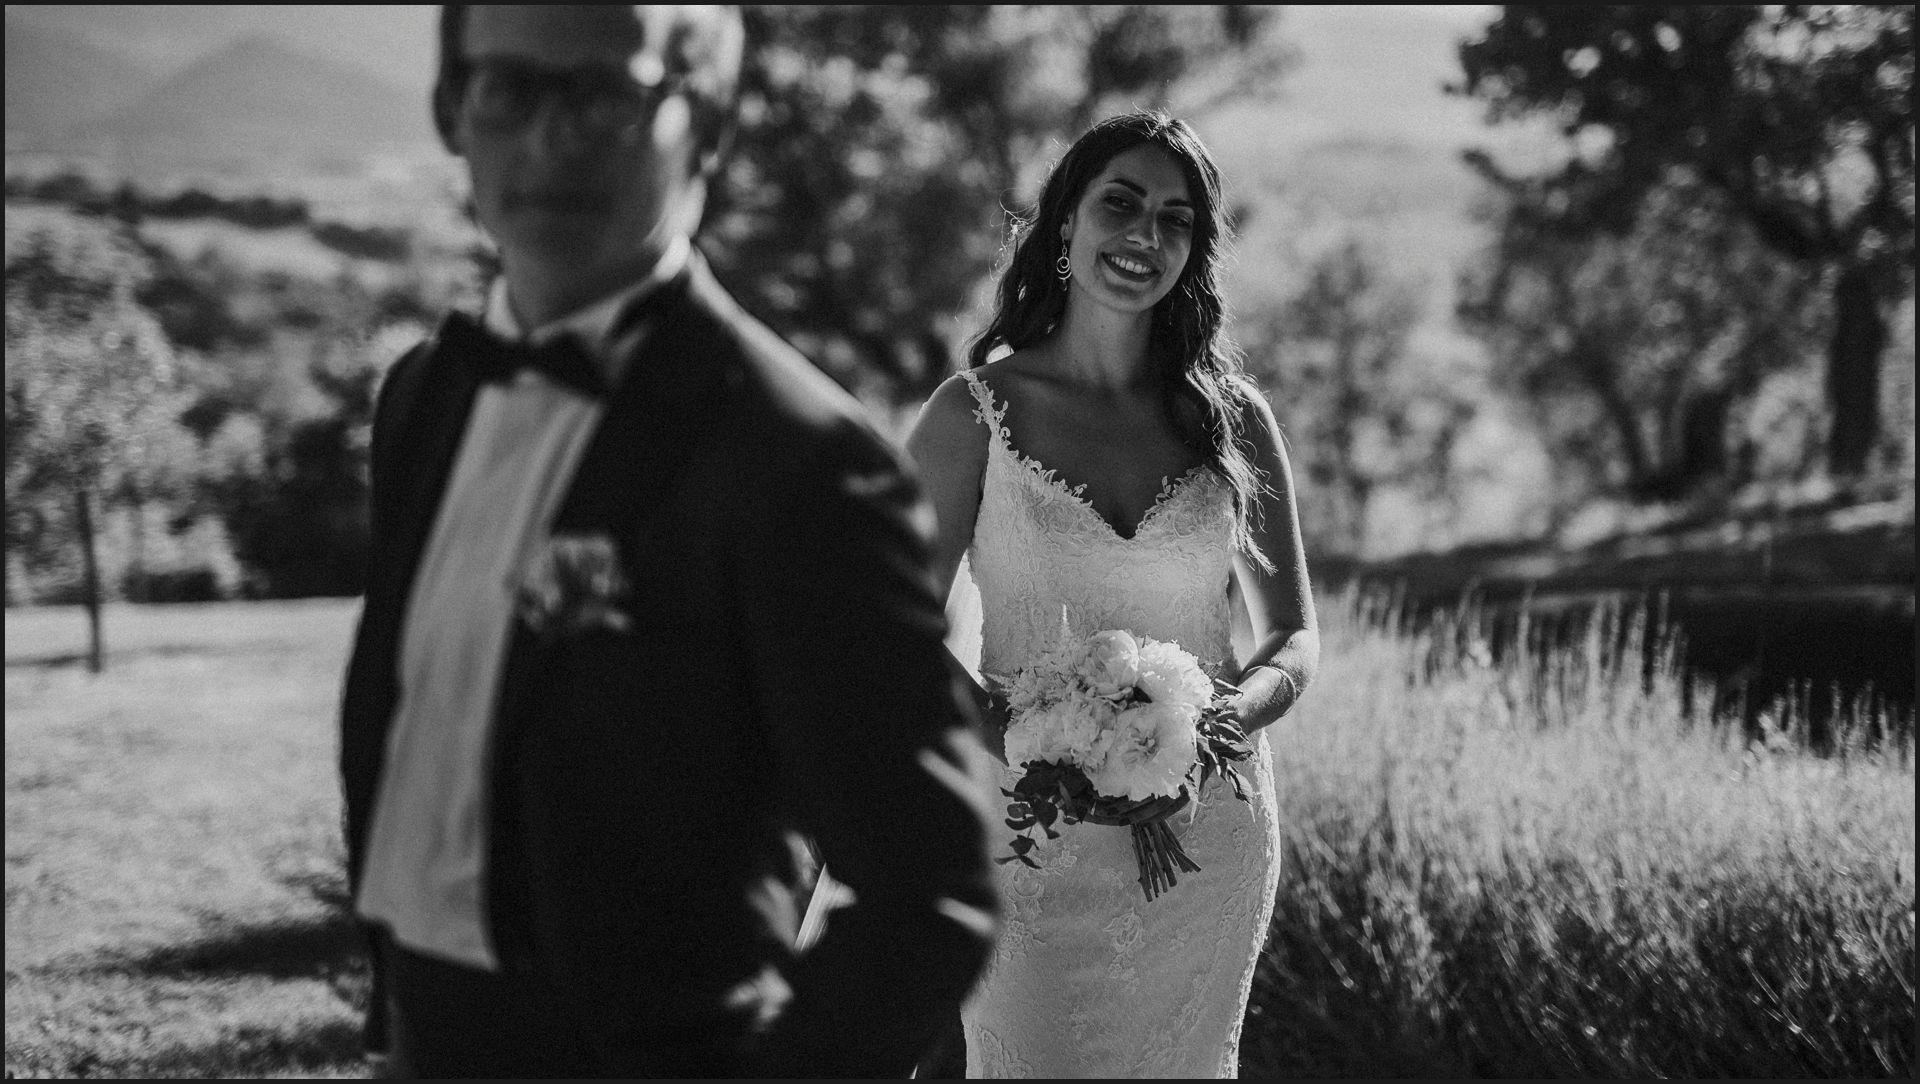 black and white, wedding, umbria, nikis resort, bride, groom, flowers